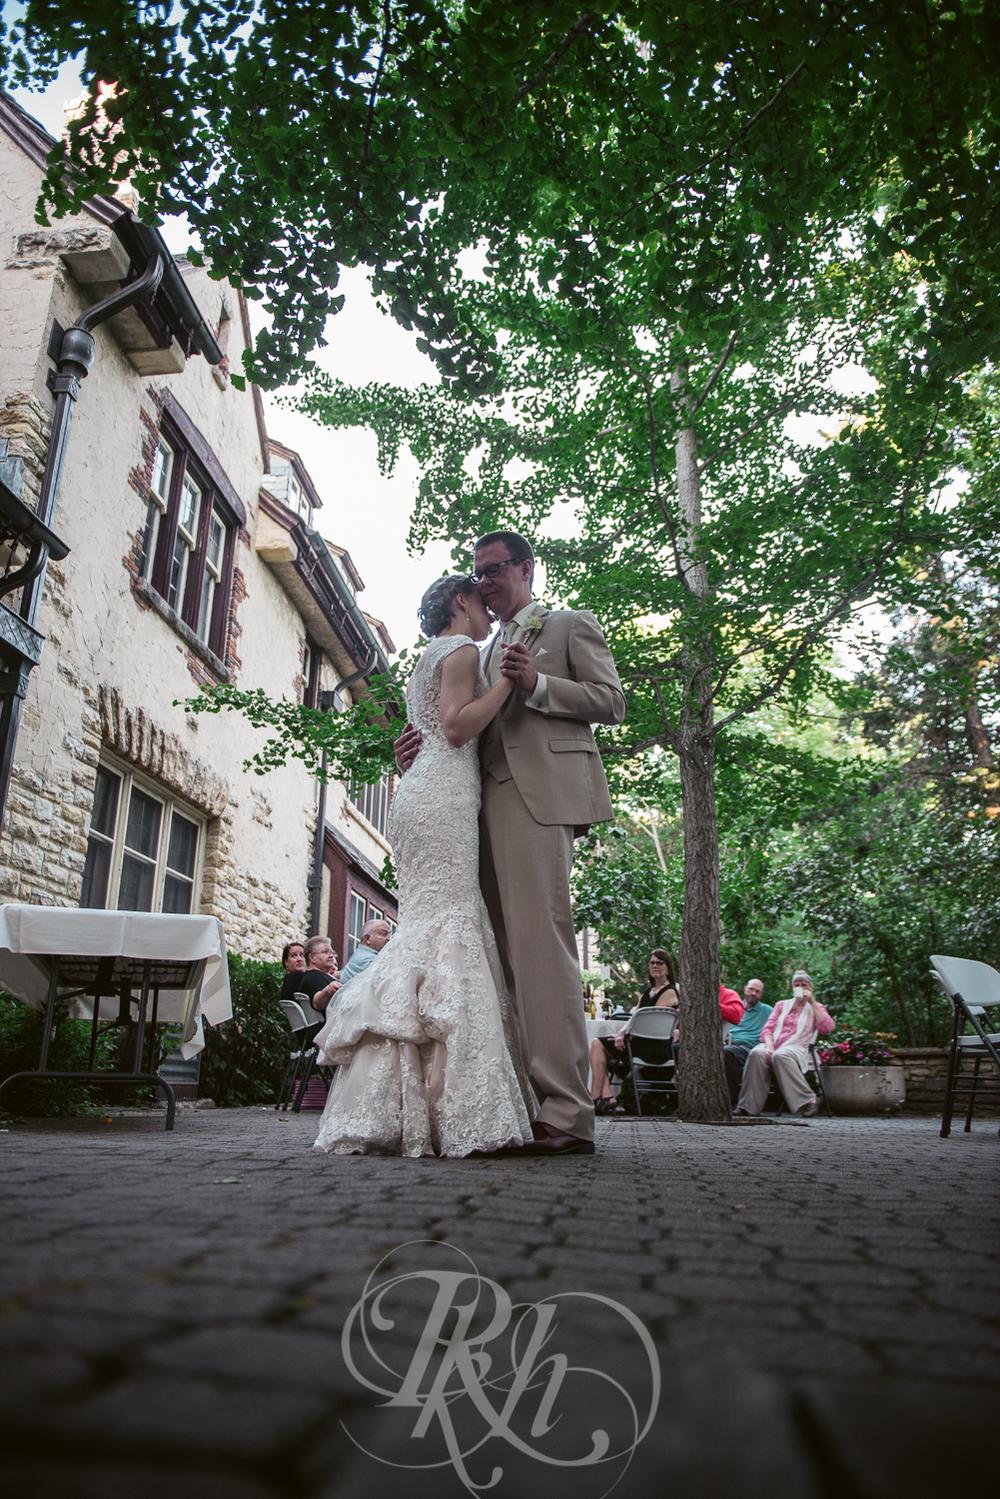 Erin & Jared - Minnesota Wedding Photographer - RKH Images - Blog - Reception-5.jpg